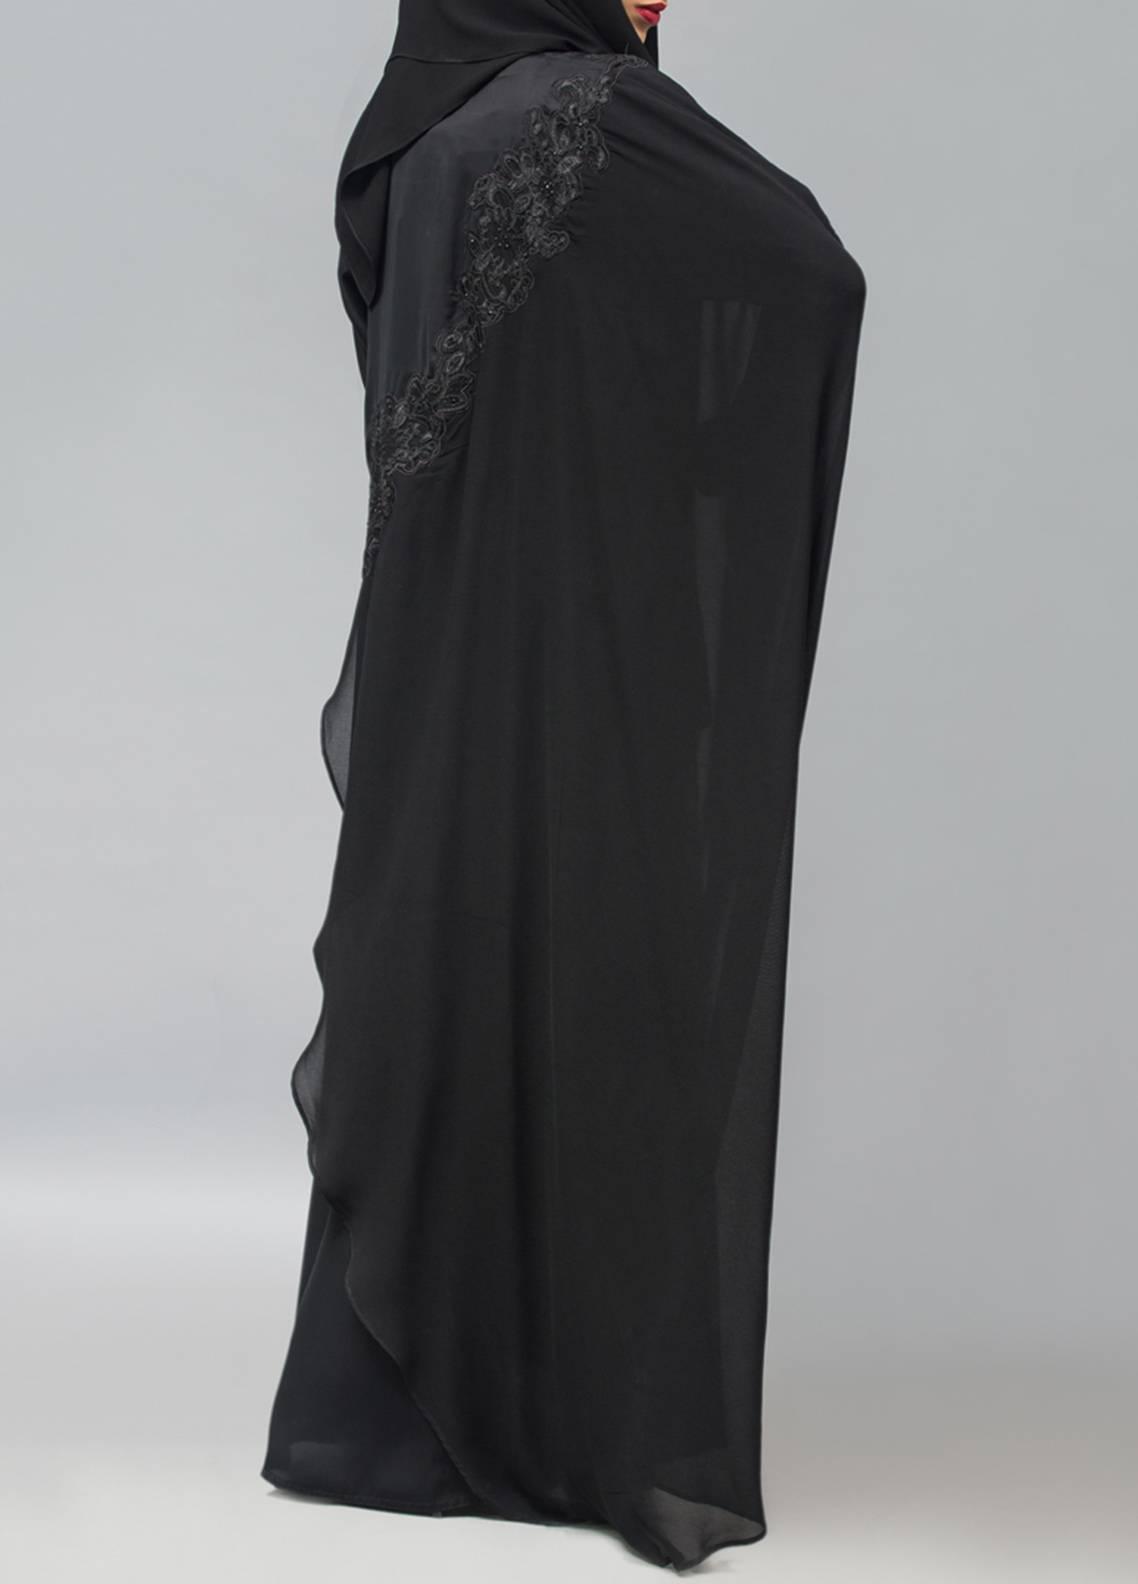 Hijab ul Hareem Pullover  Stitched Abaya 0120-RC-904